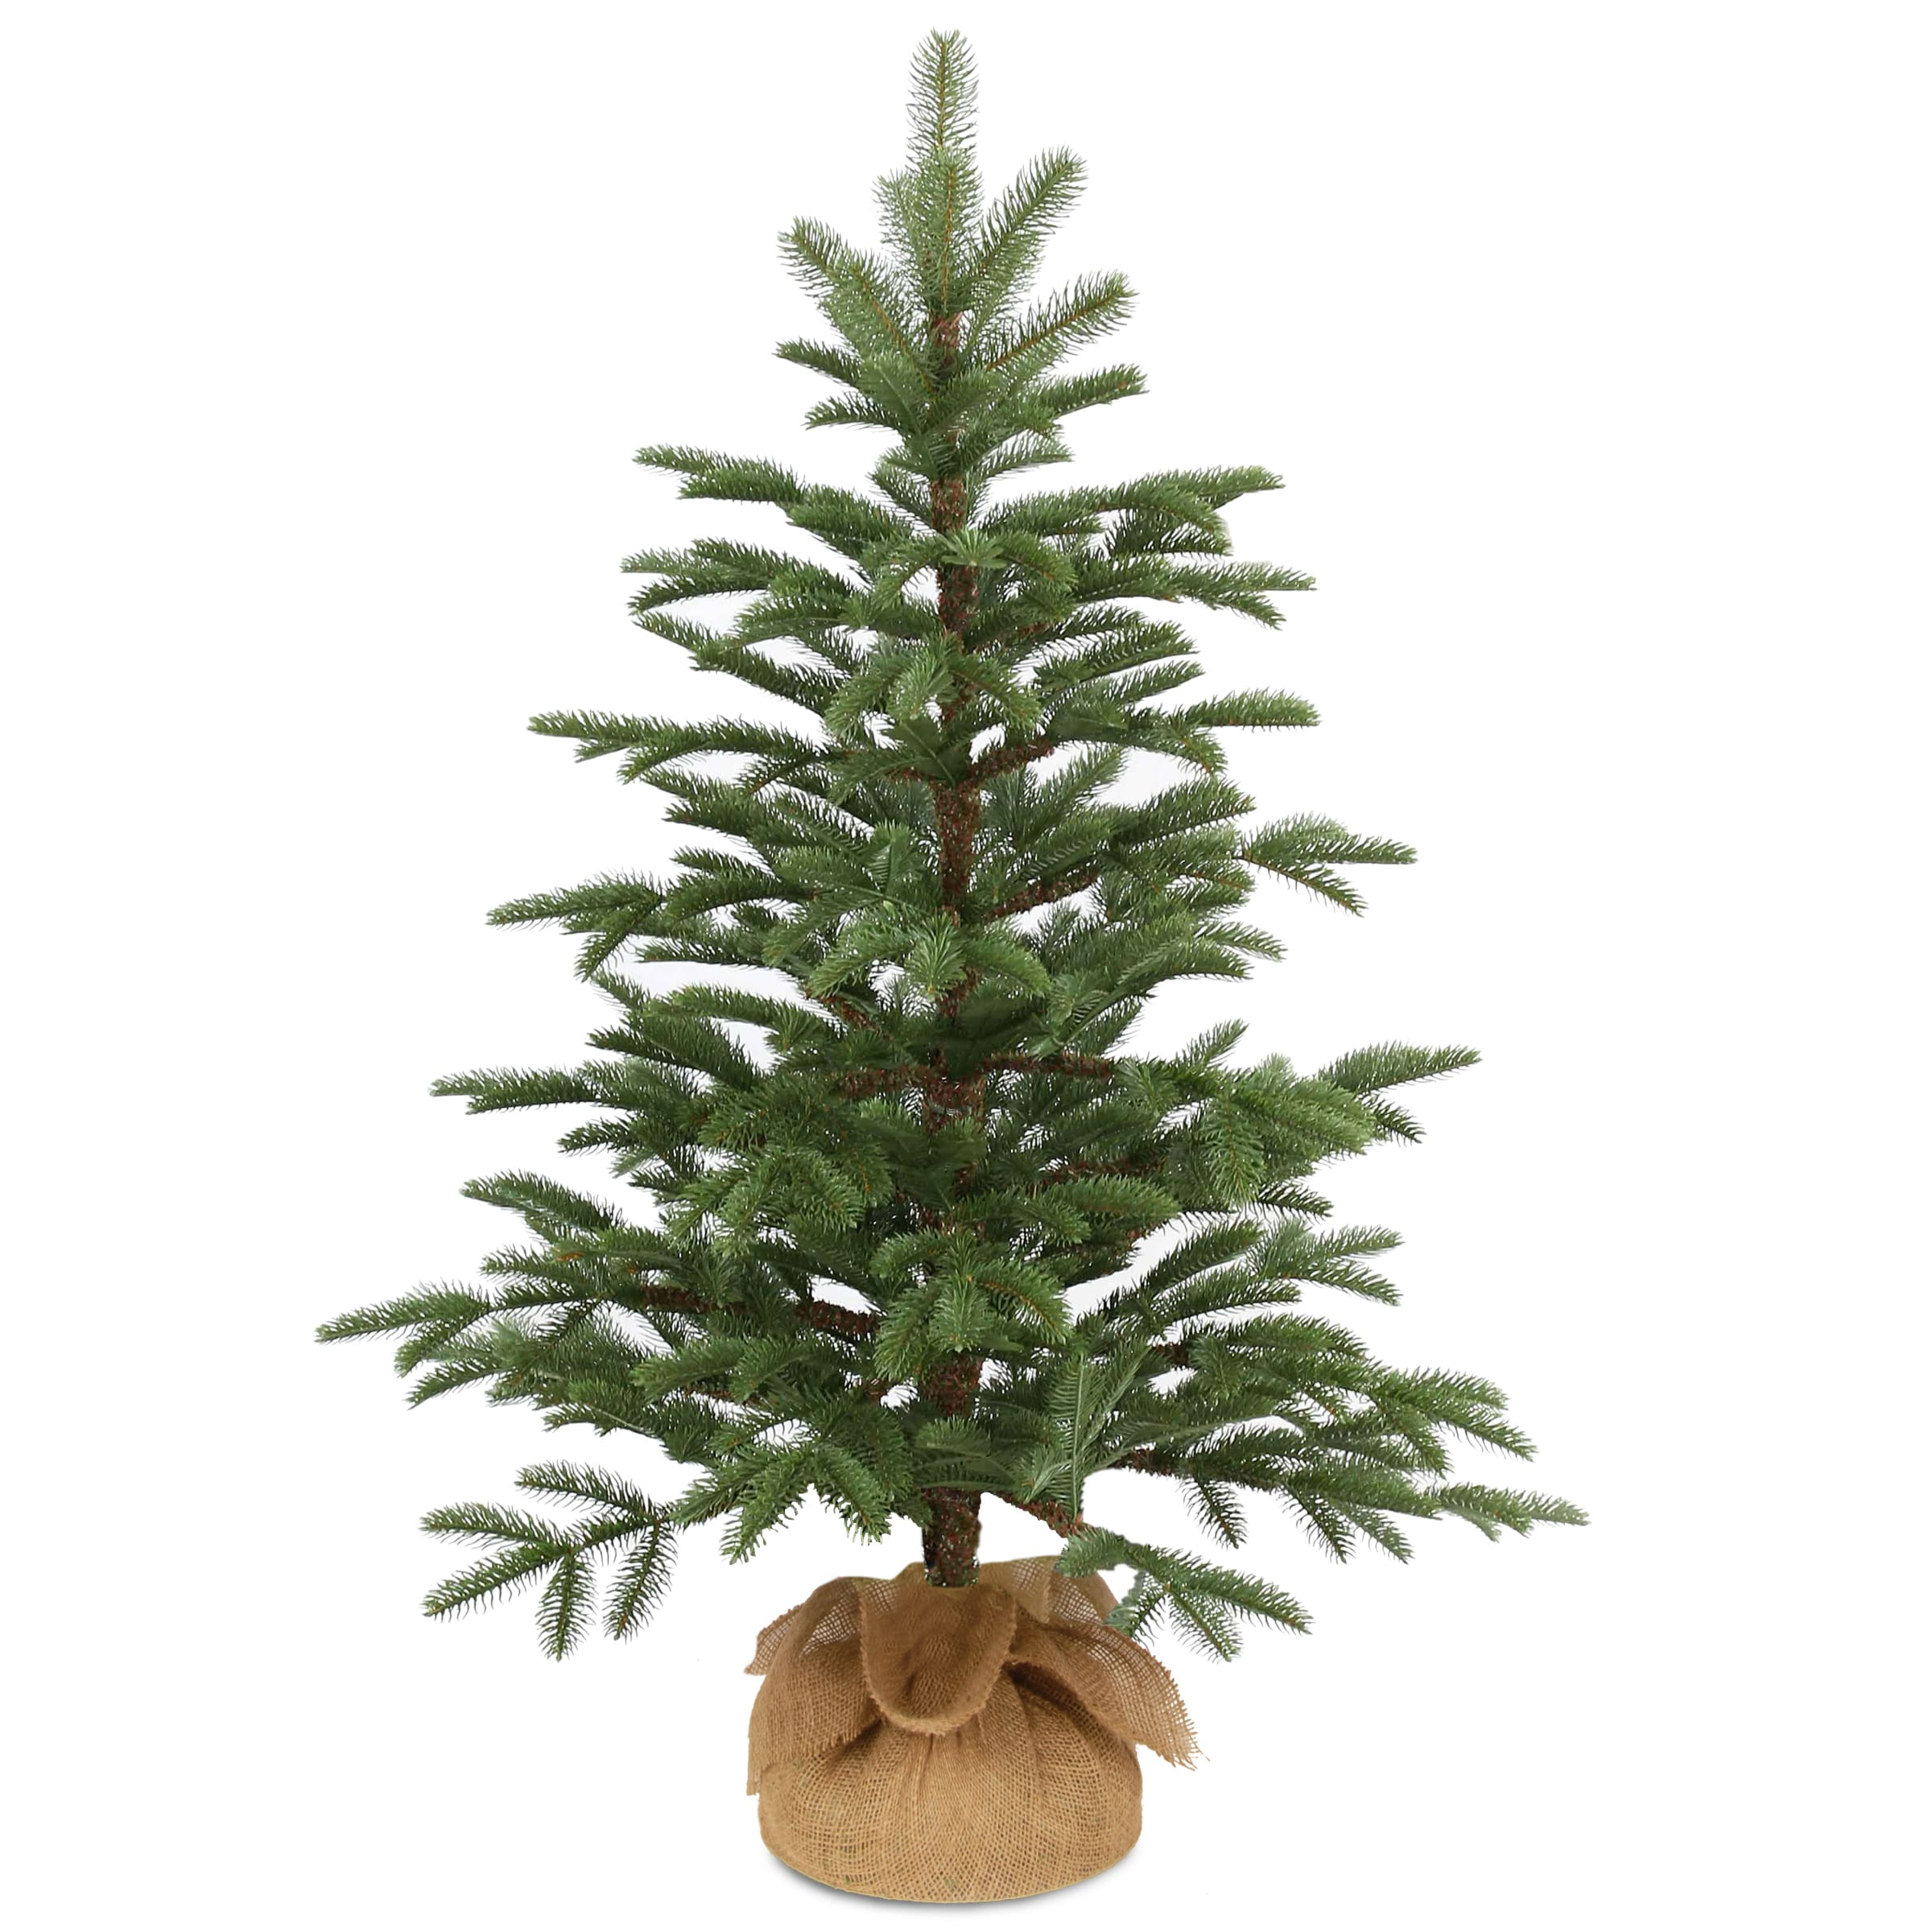 Christmas Tree Seeds.National Tree Company 3 Norwegian Small Decorative Seedling Christmas Tree In Burlap